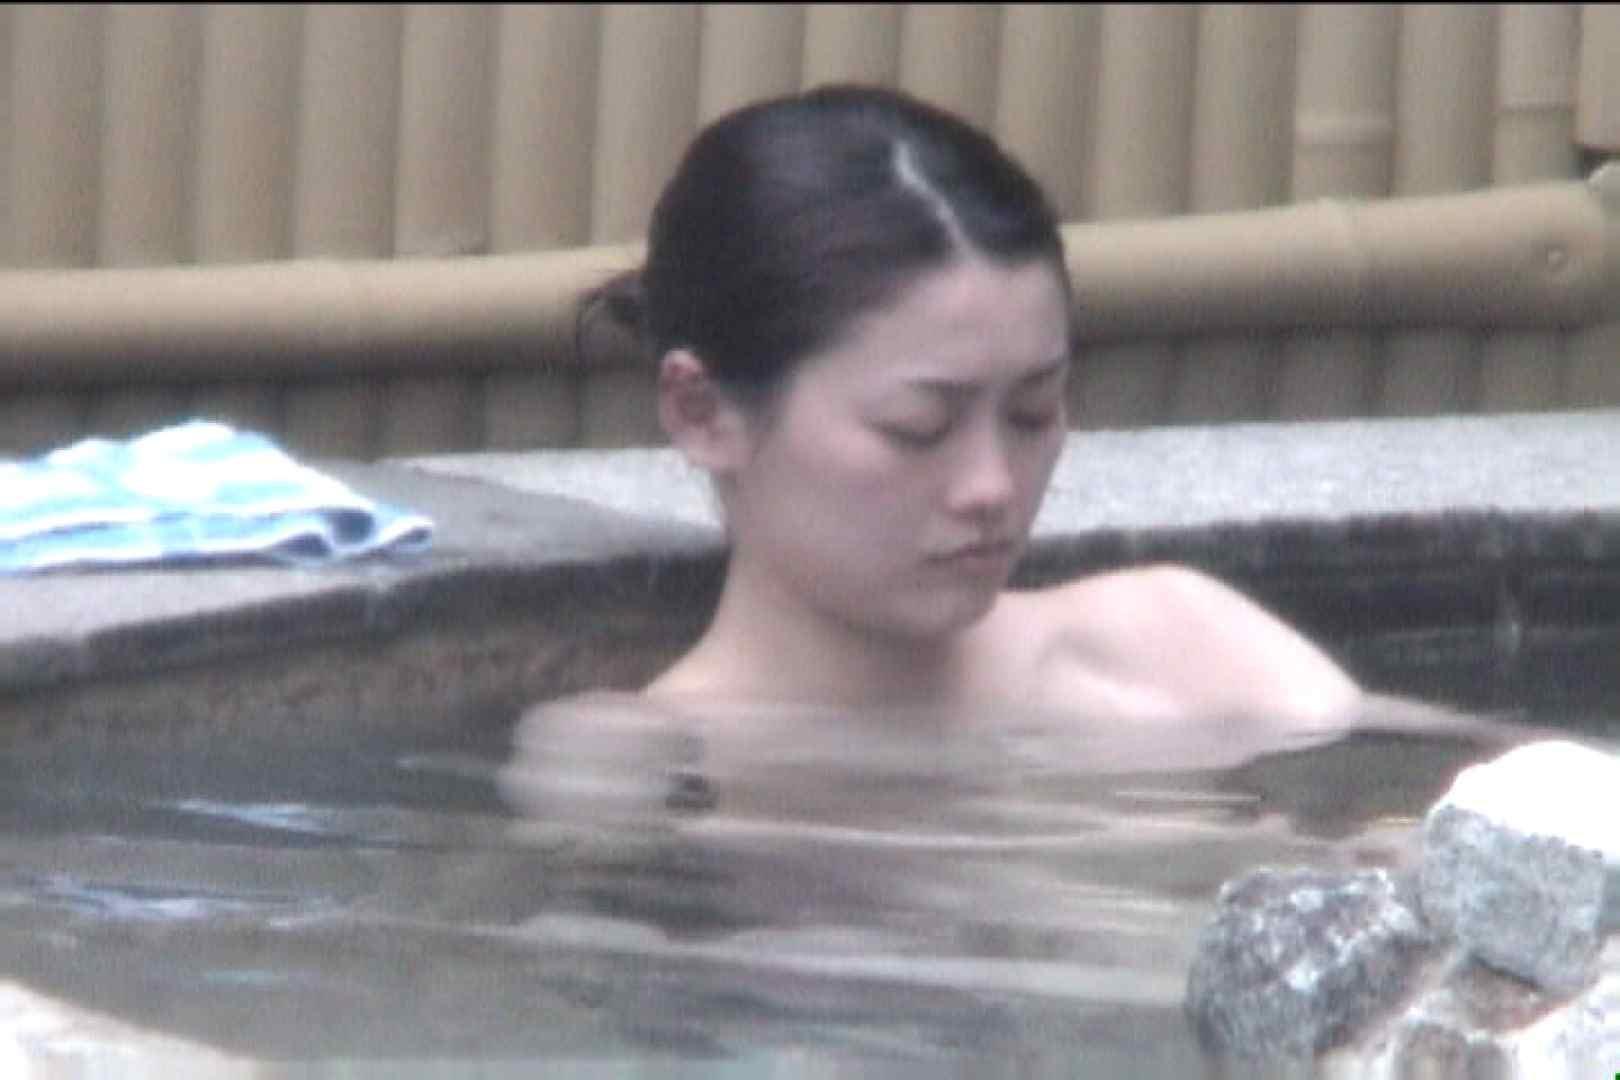 Aquaな露天風呂Vol.92【VIP限定】 露天風呂 盗撮動画紹介 33連発 20